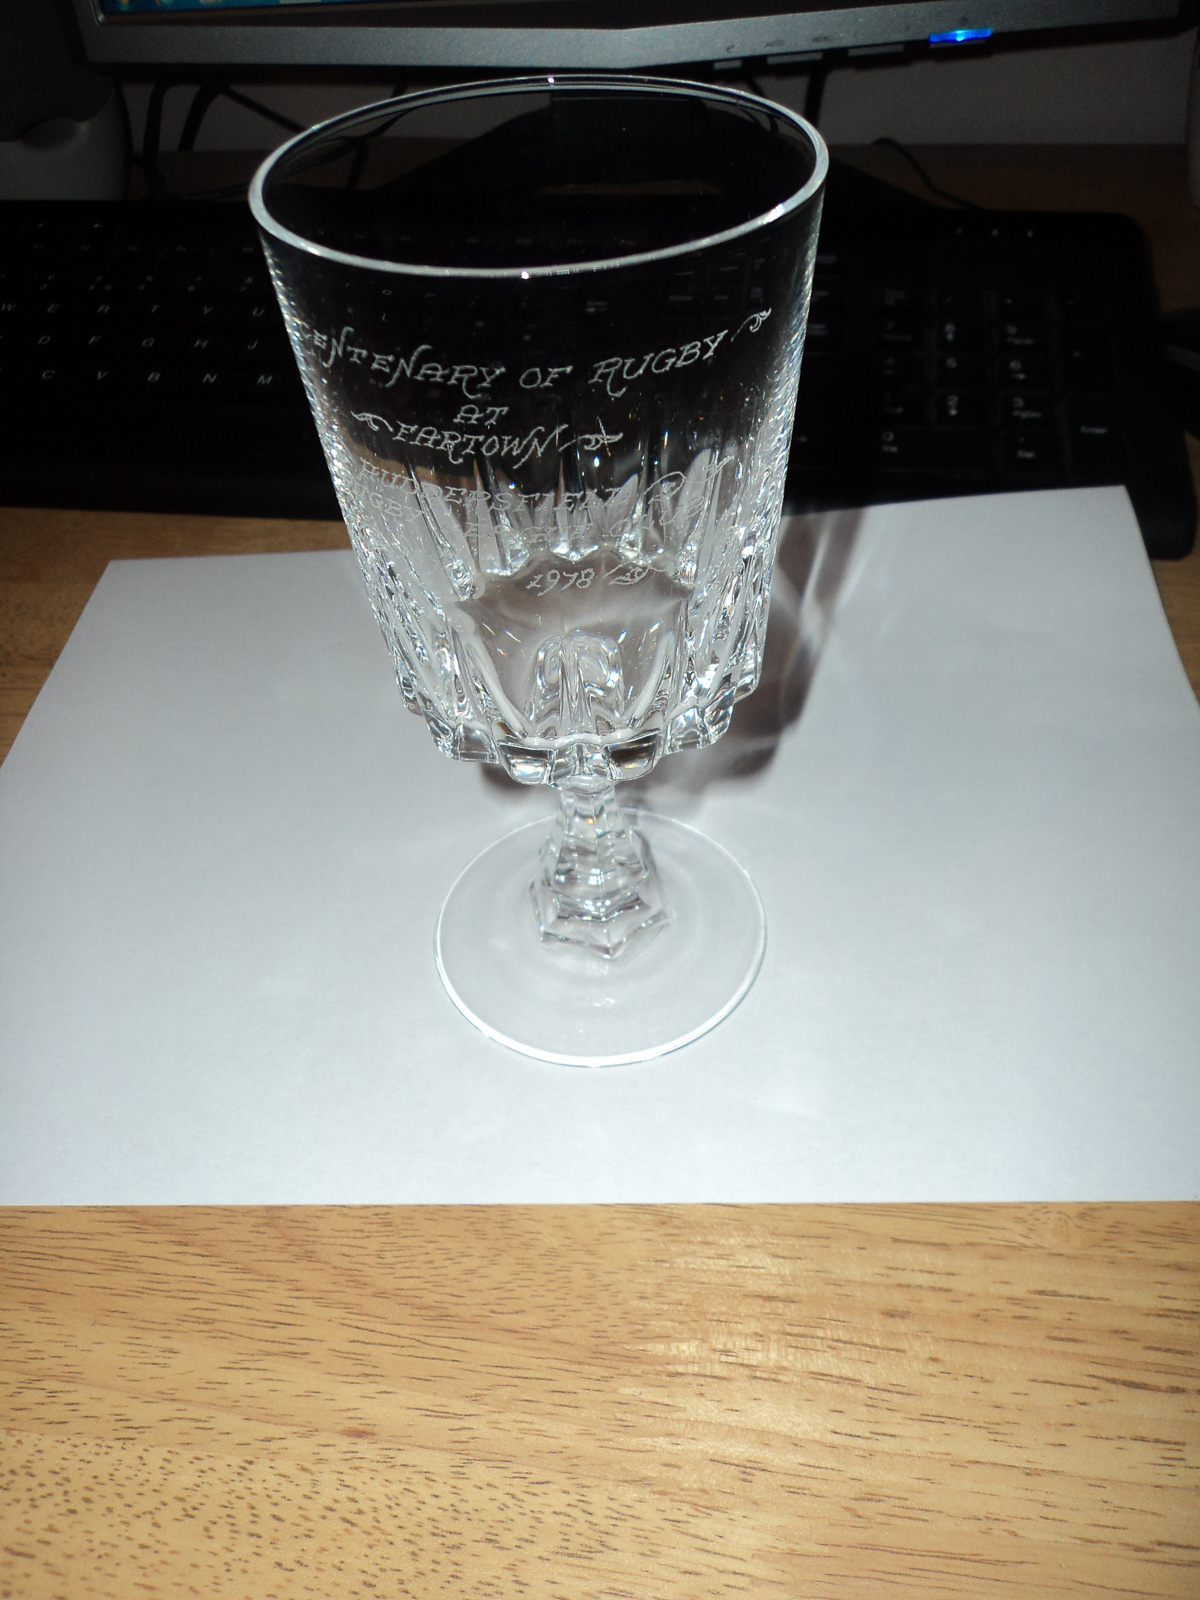 Fartown_100yrs_cut_glass.jpg